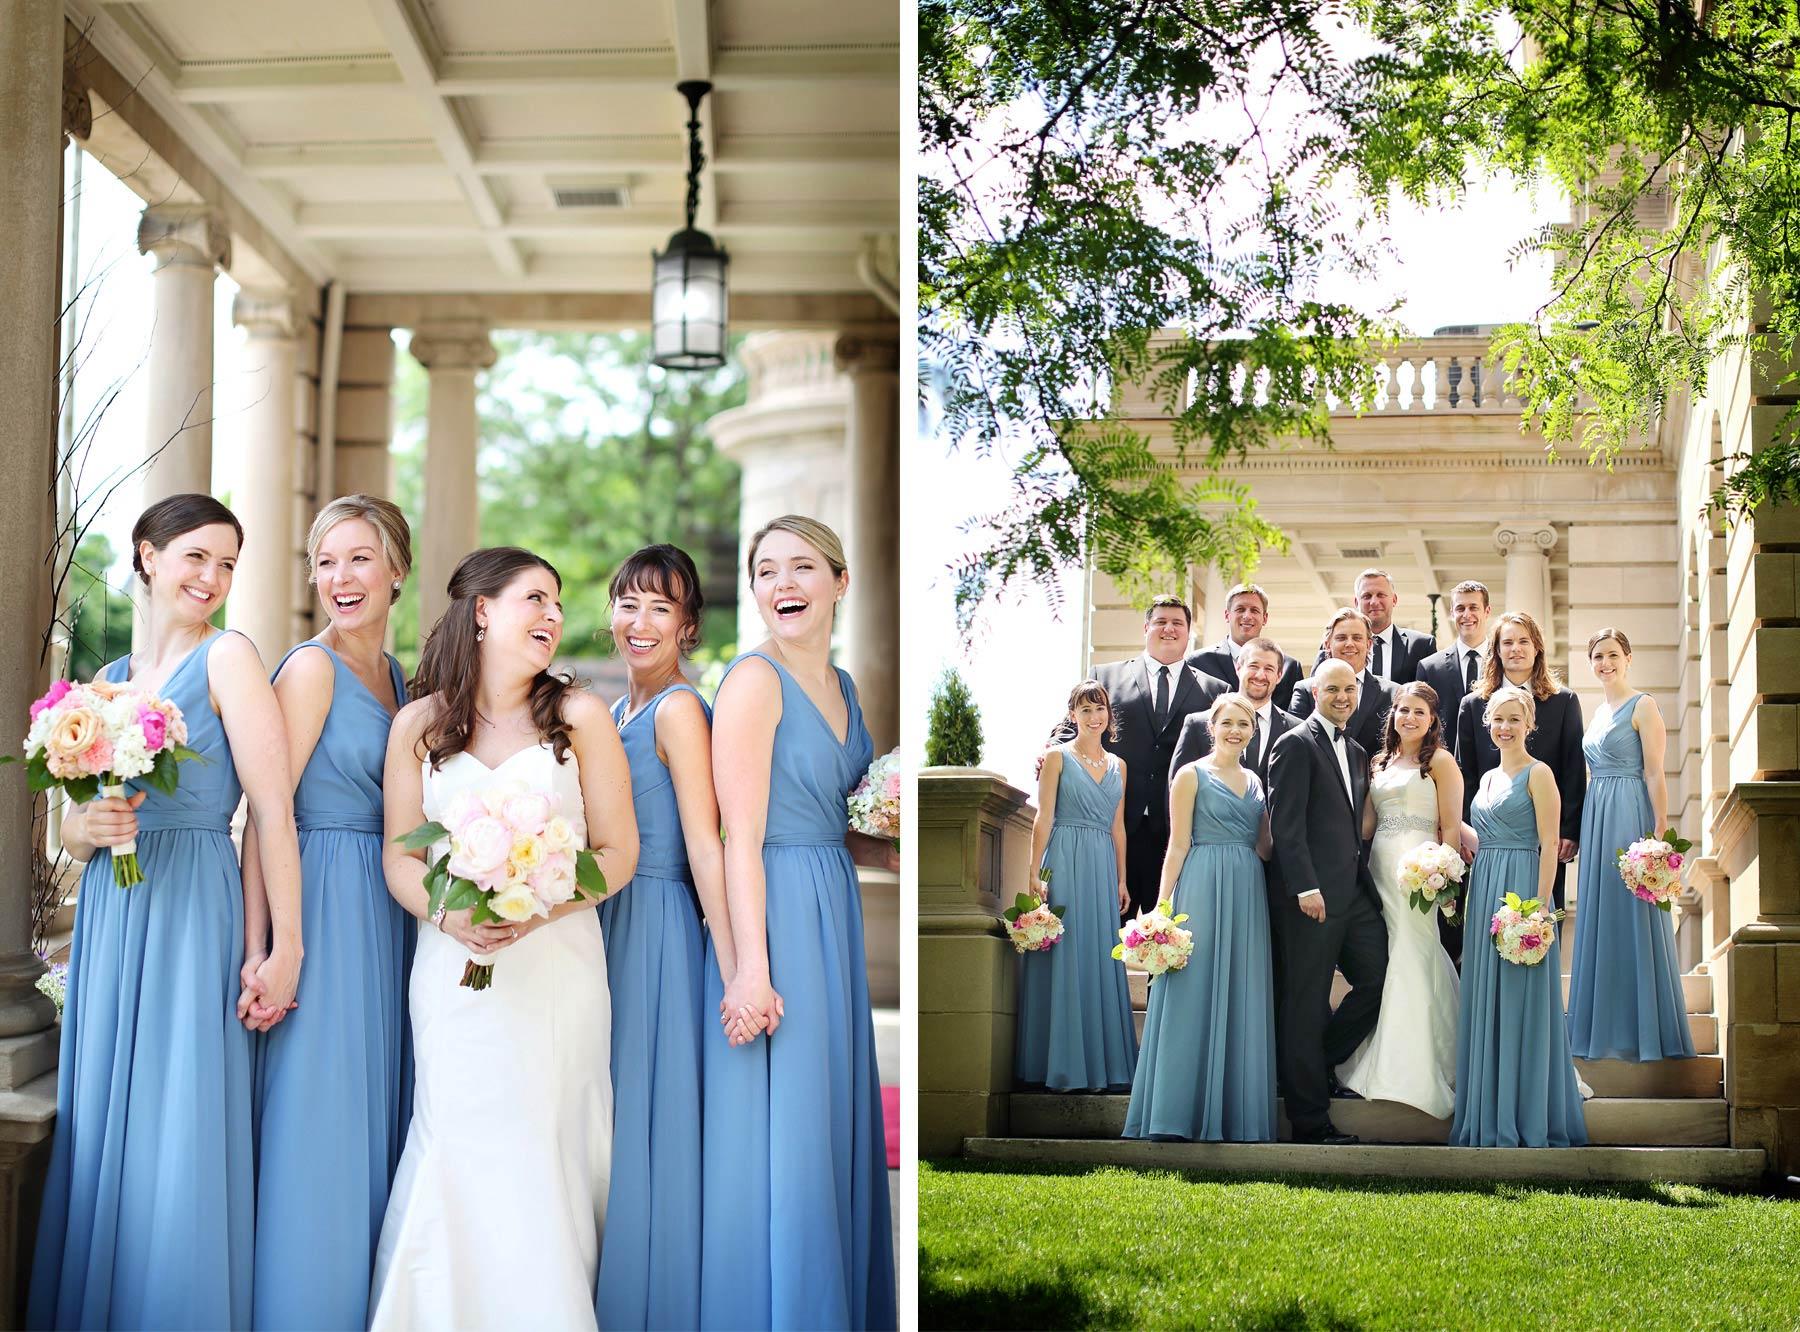 07-Minneapolis-Minnesota-Wedding-Photography-by-Vick-Photography-Semple-Mansion-Nikki-and-Matt.jpg